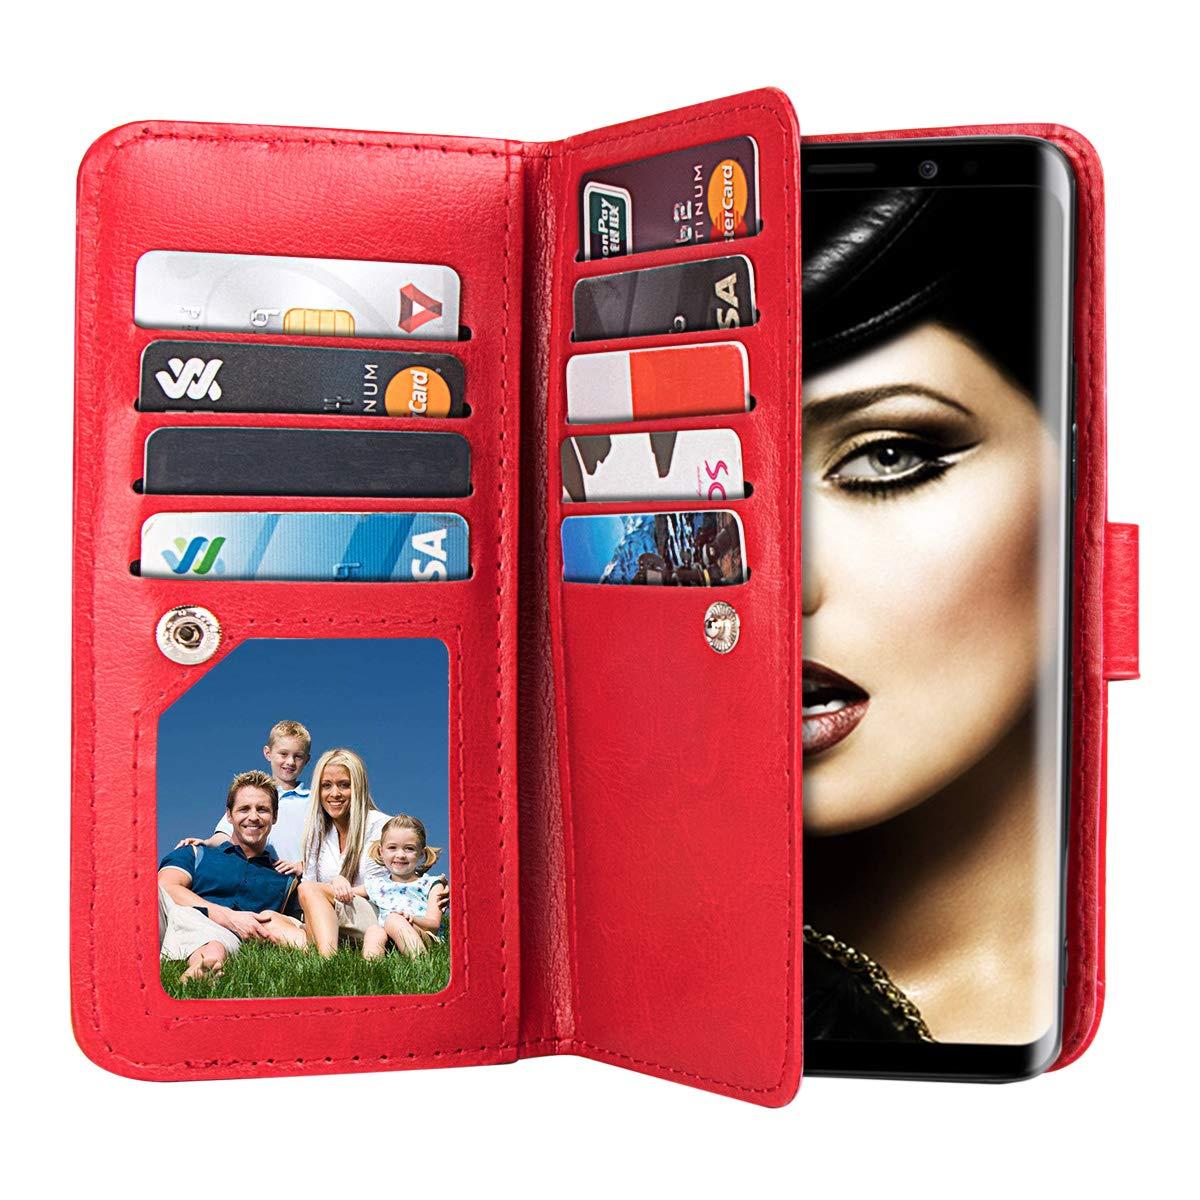 xhorizon FLK Premium Leather Folio Case [Wallet Function] [Magnetic Detachable] Wristlet Purse Soft Multiple Card Slots Cover Samsung Galaxy Note 9